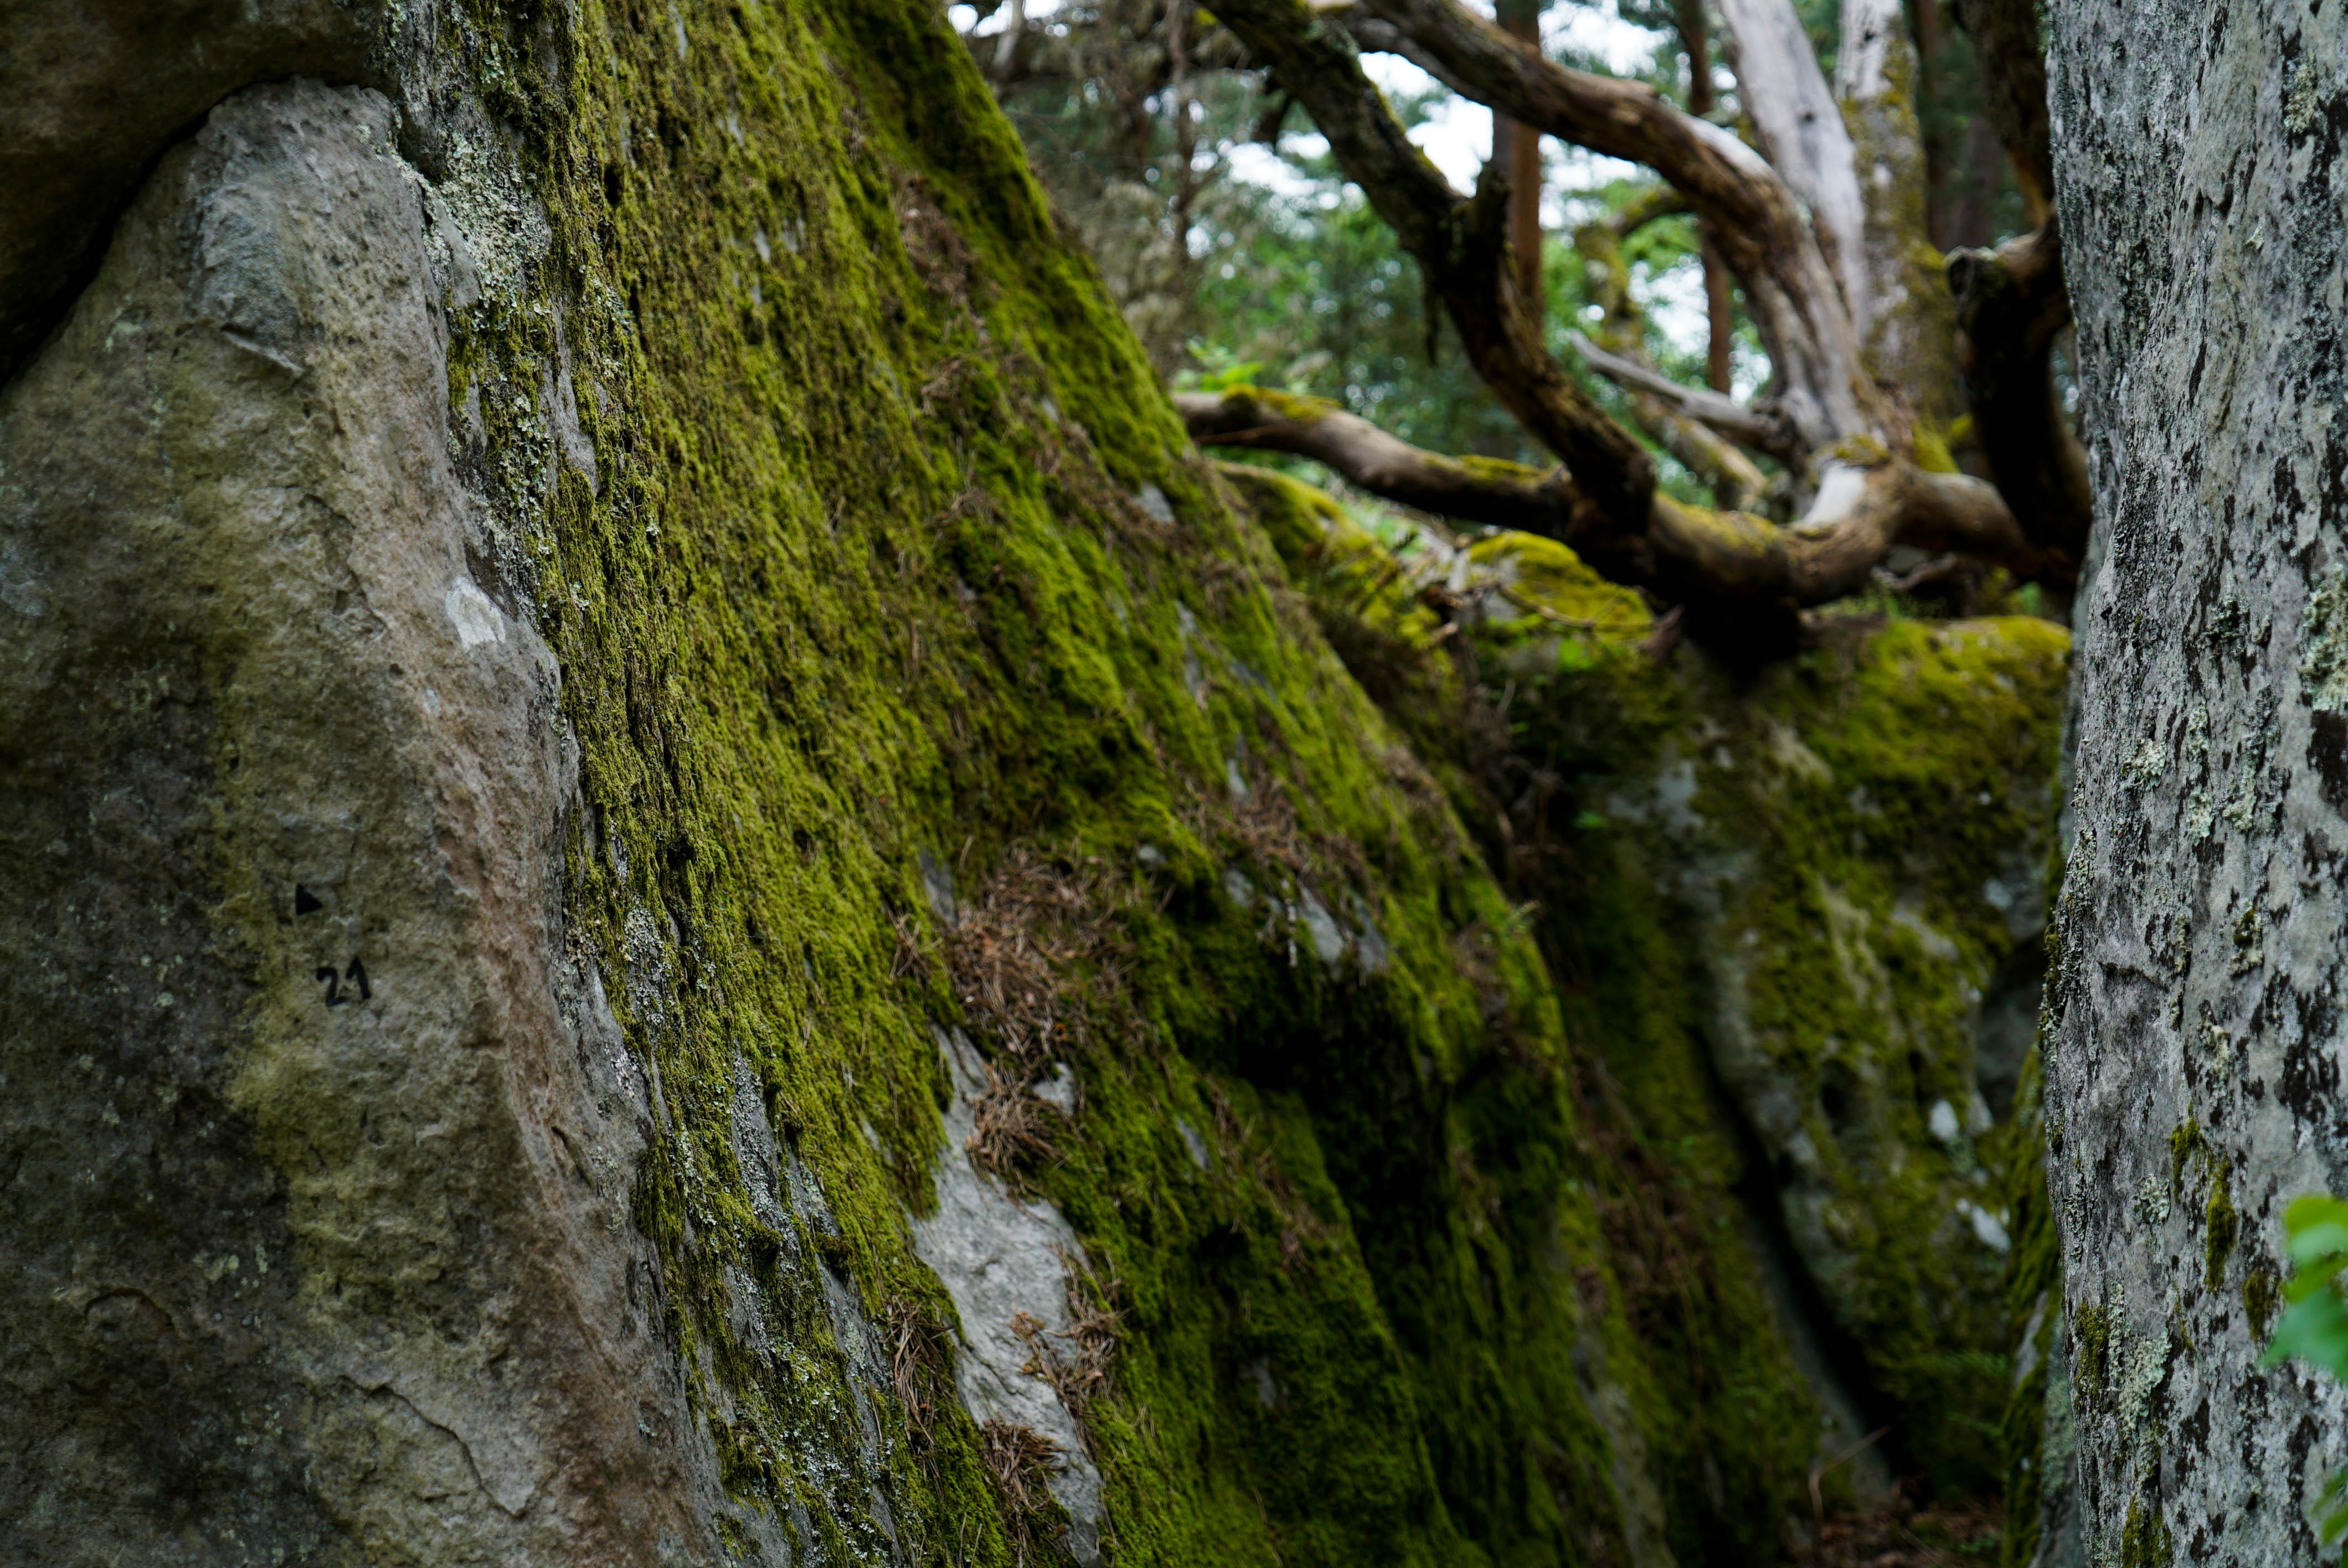 fontainbleau climbing 2016 mike brindley-114